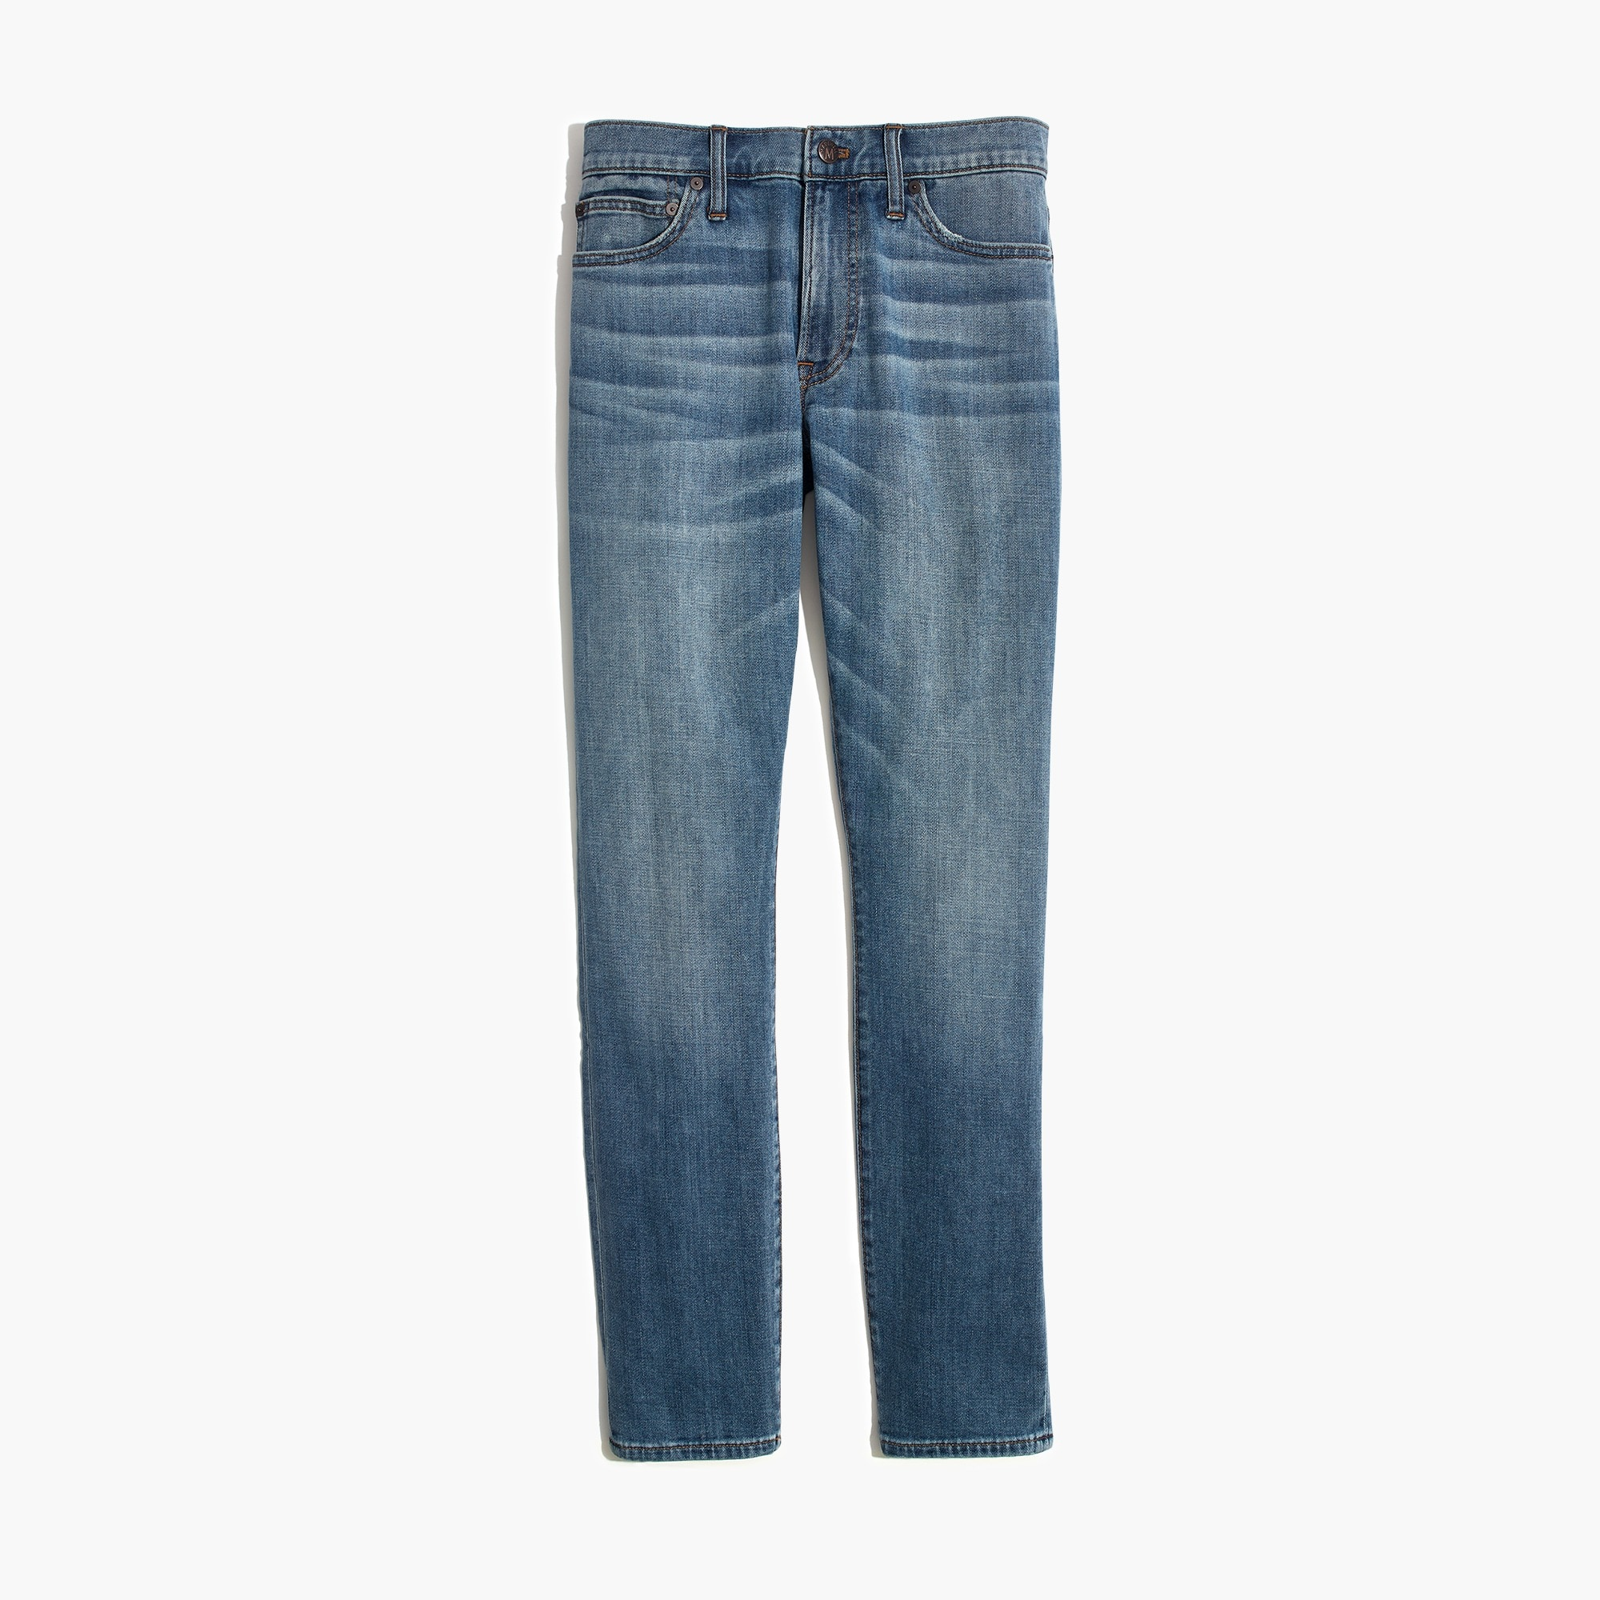 Madewell Skinny-fit jean in Stevens wash